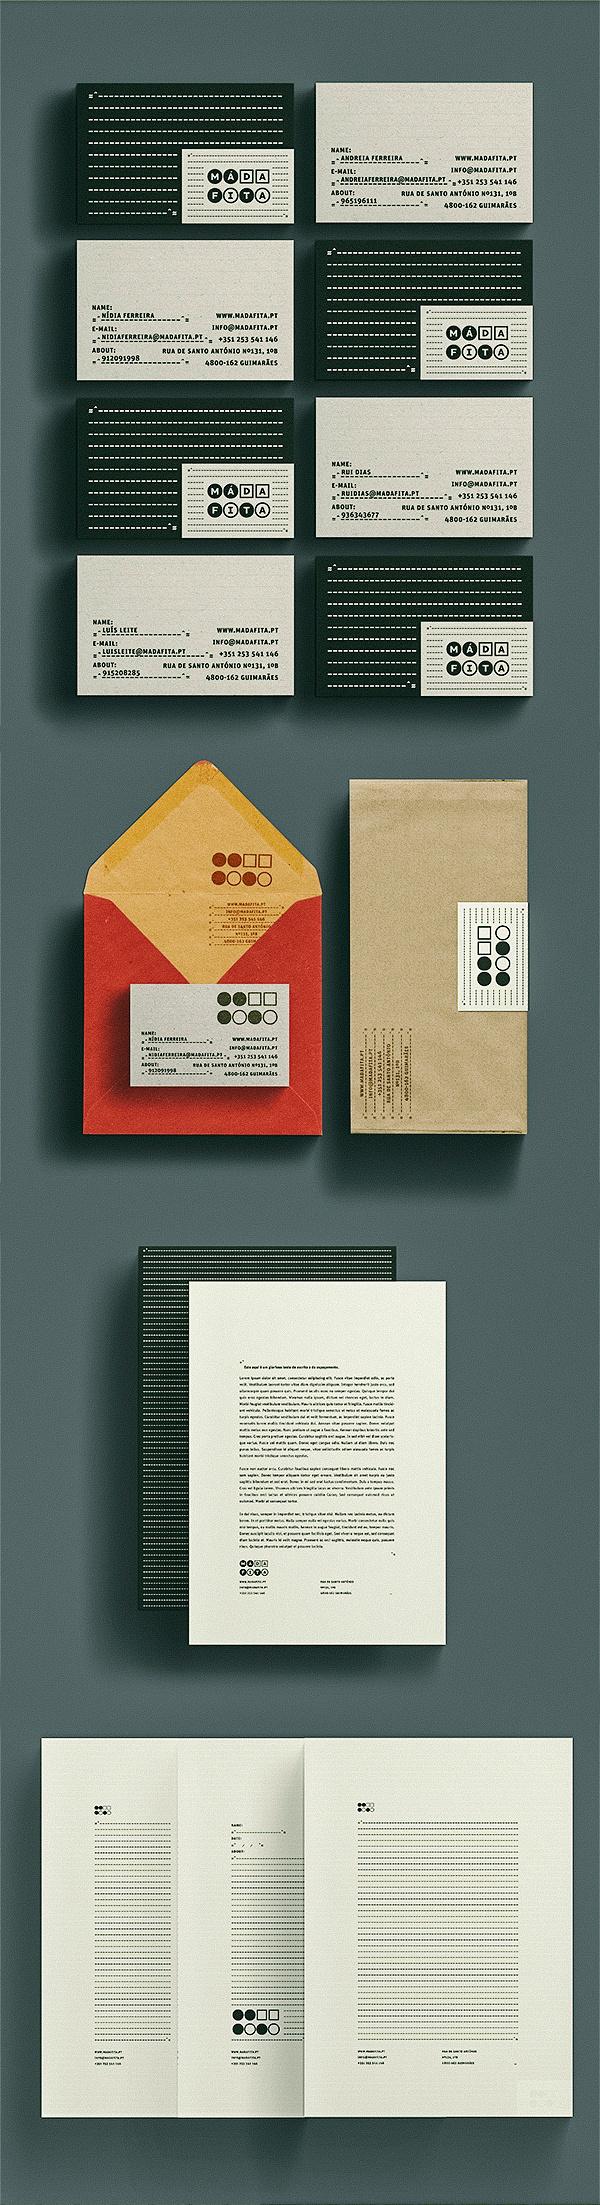 Má da Fita Identity on Branding Served #design